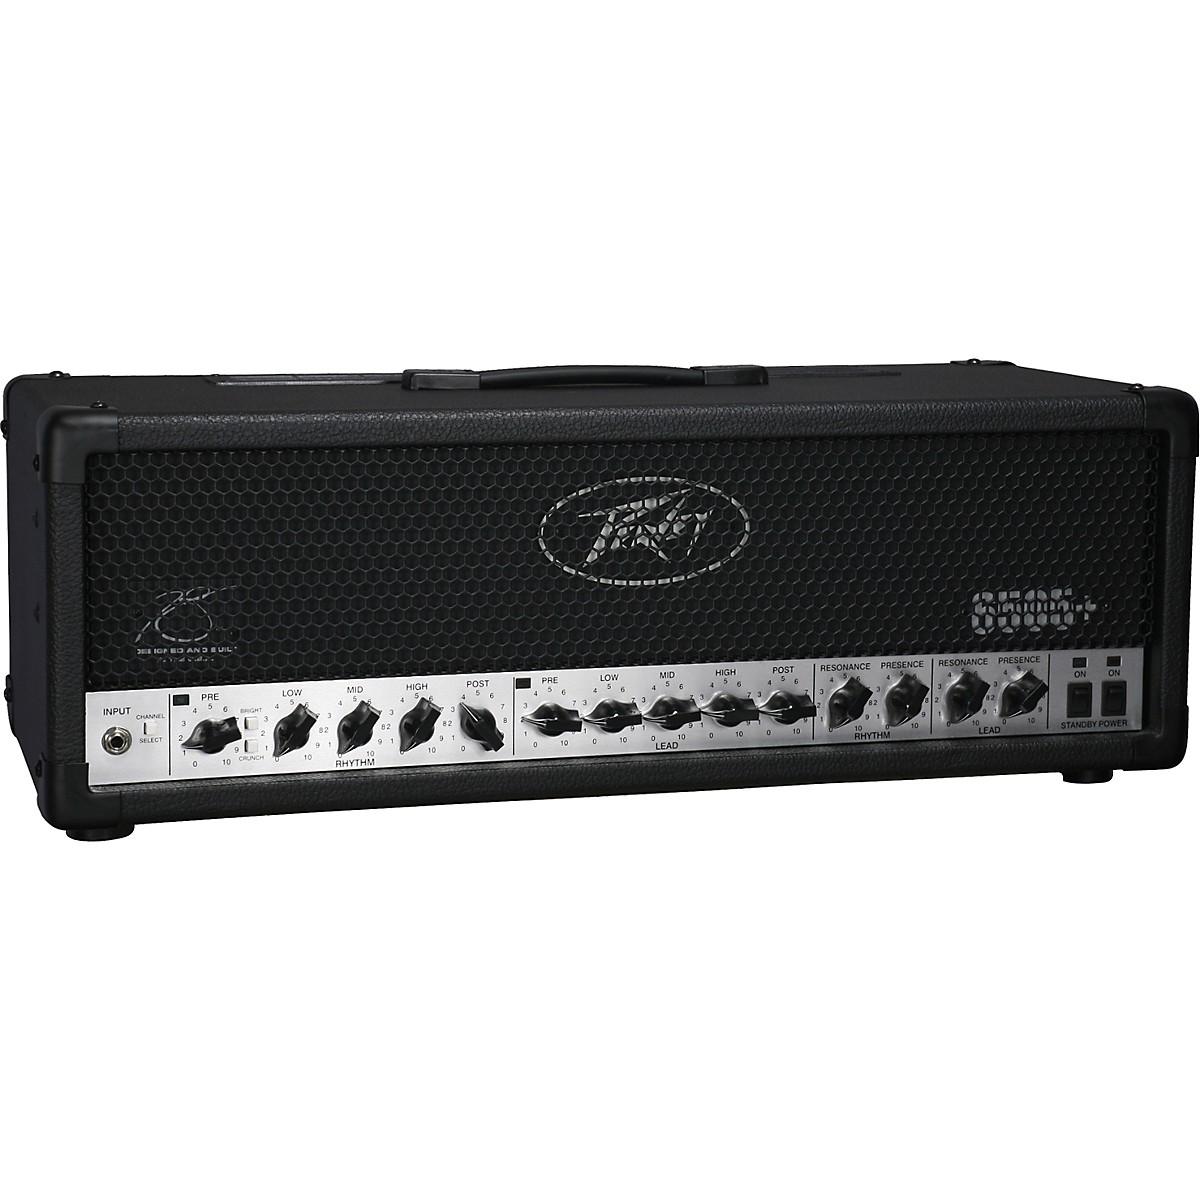 Peavey 6505+ 120W Guitar Amp Head